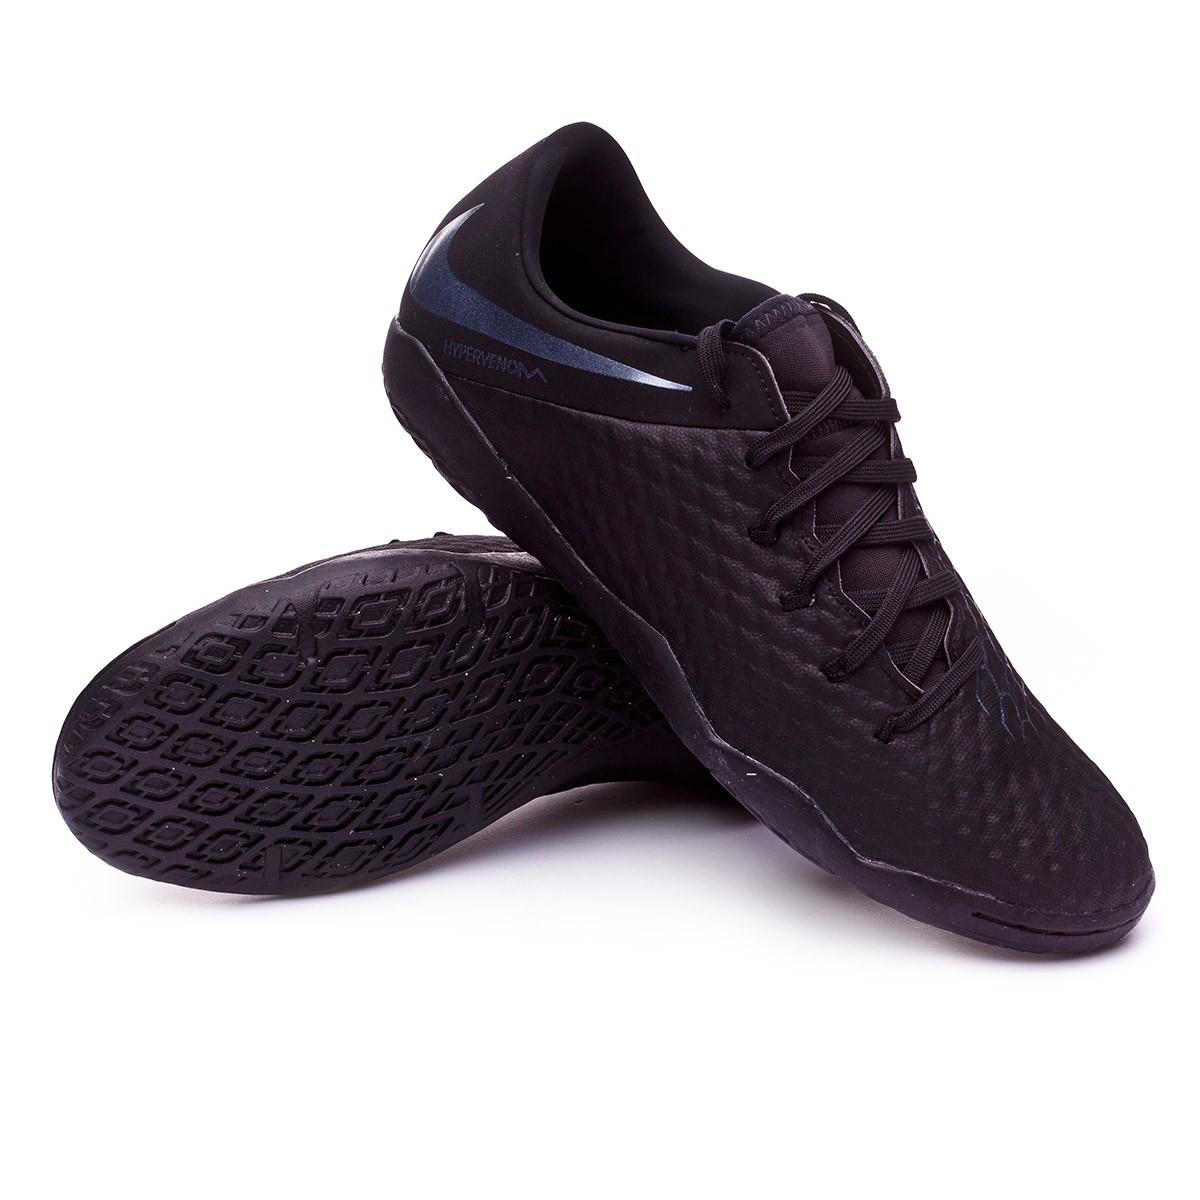 8d4fbeb8175 Futsal Boot Nike Hypervenom Phantom III Academy IC Black - Football ...